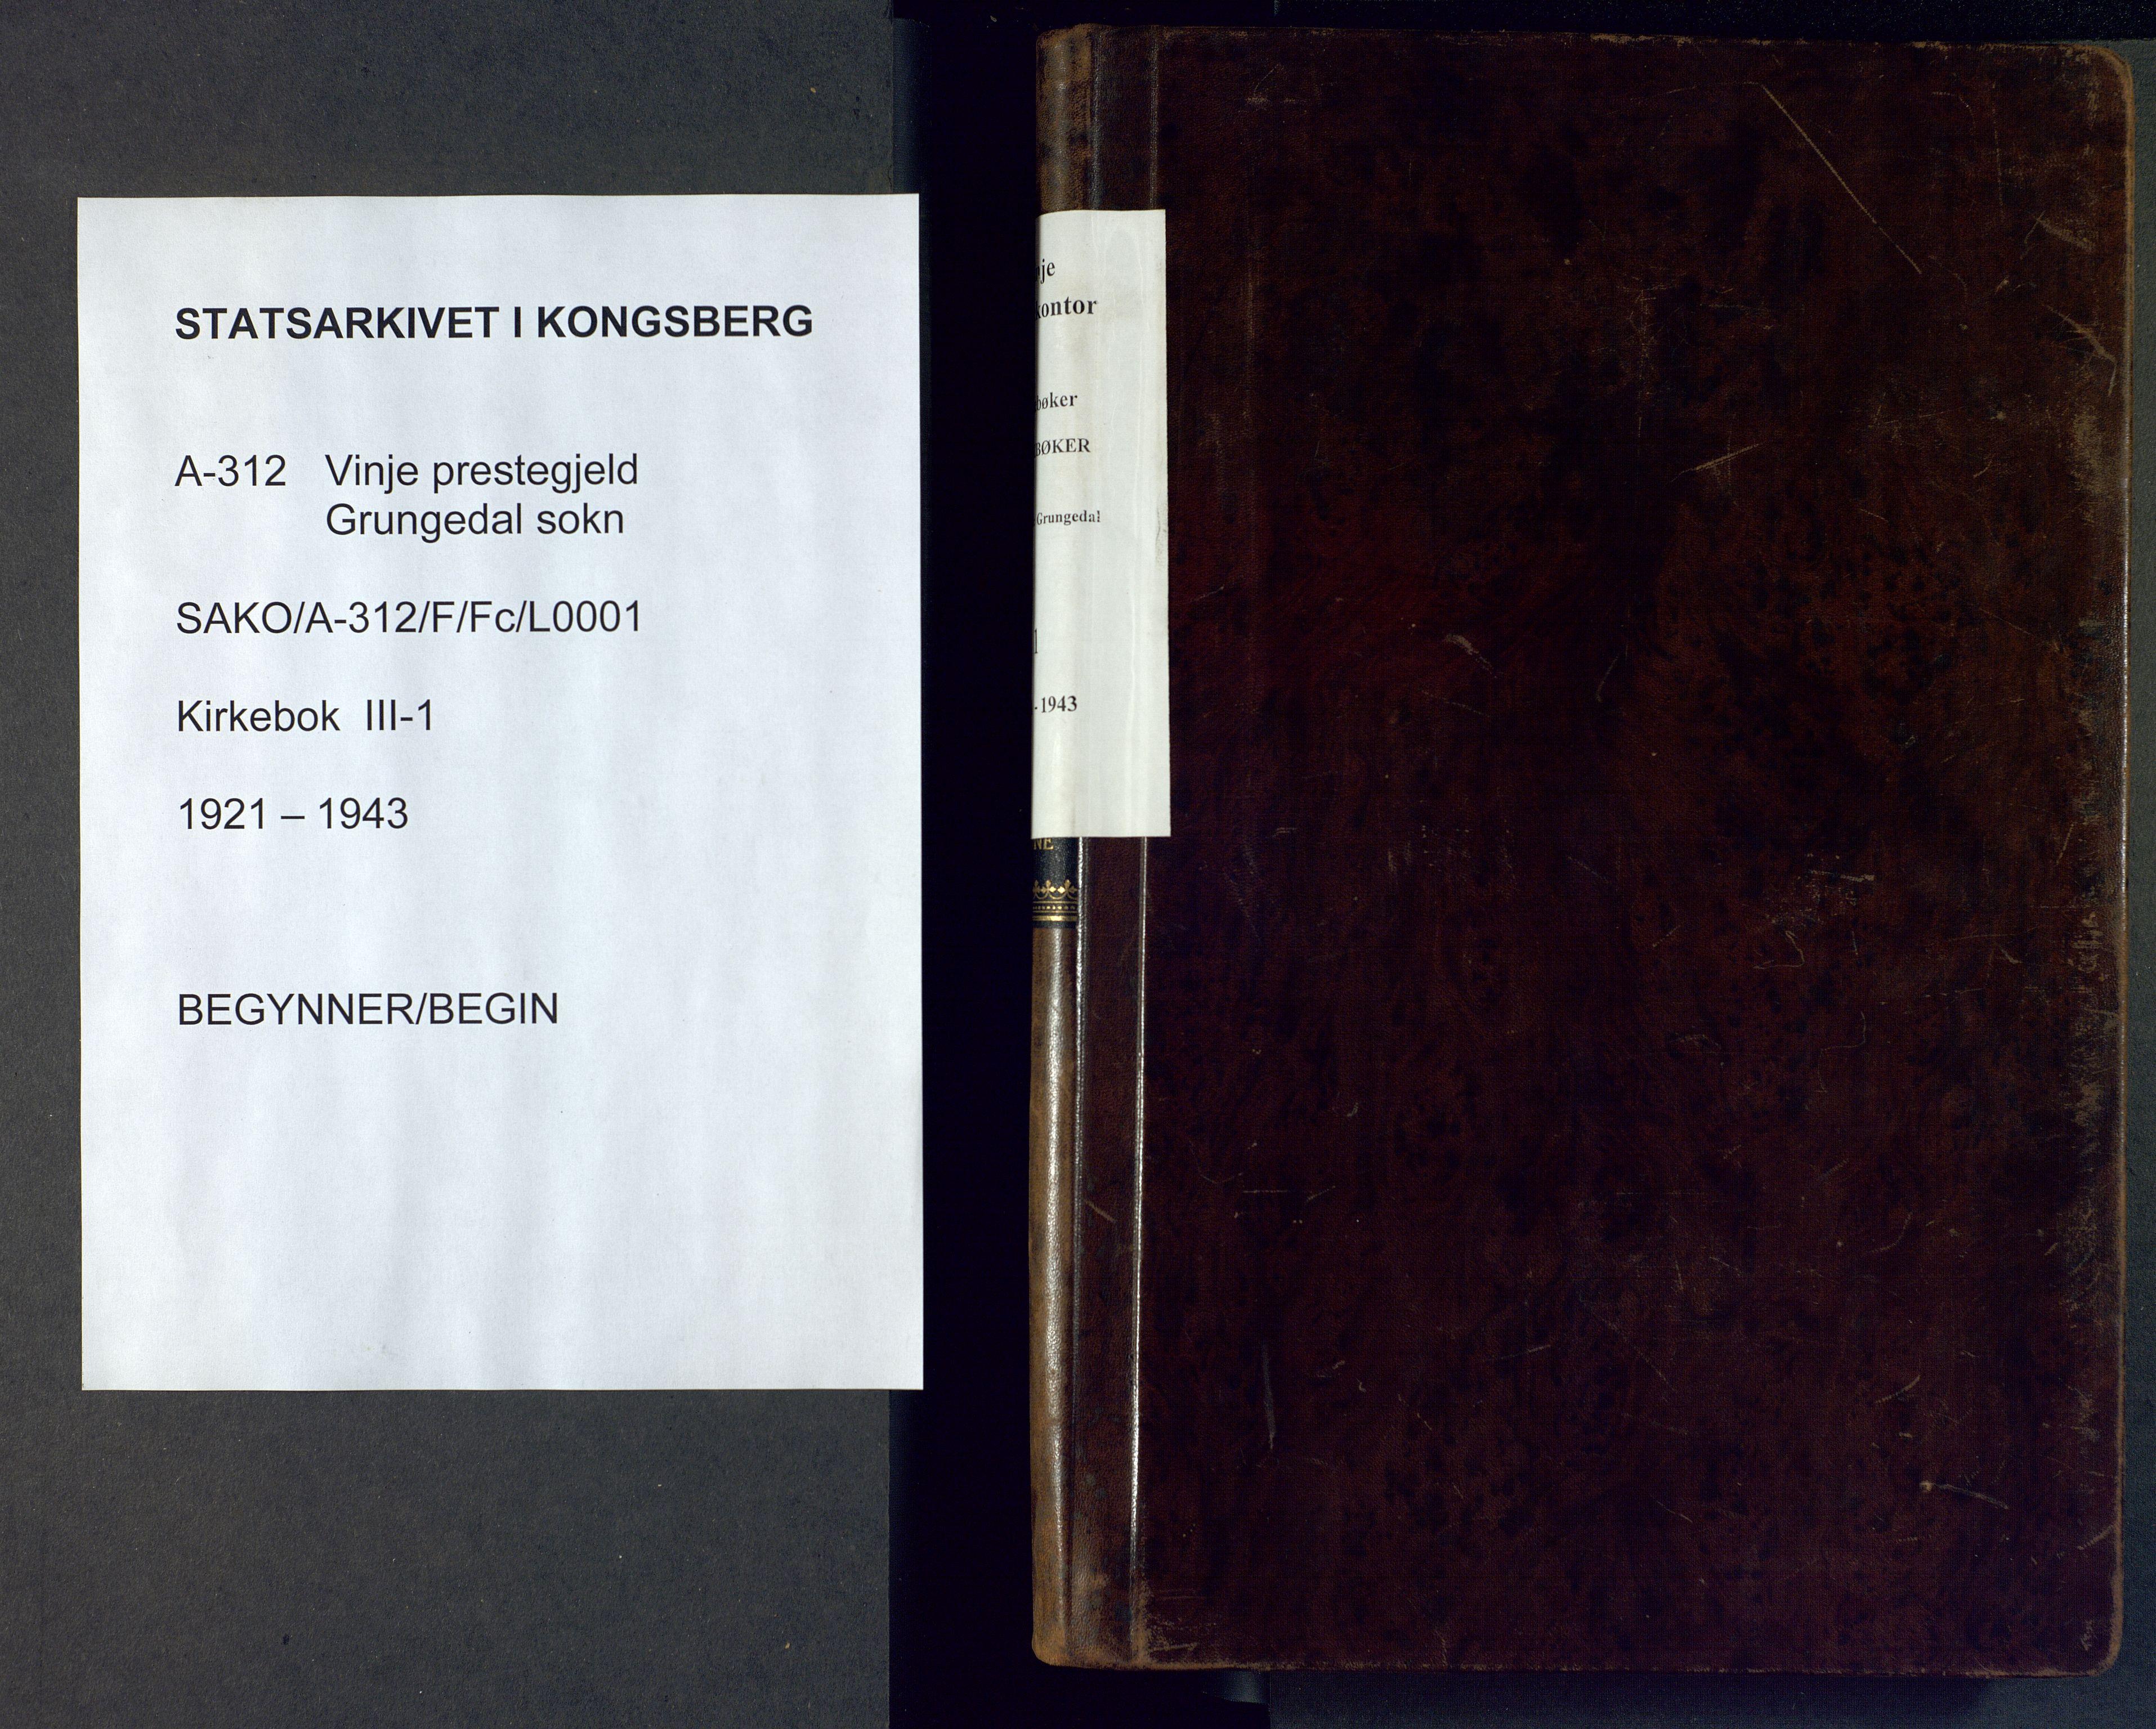 SAKO, Vinje kirkebøker, F/Fc/L0001: Ministerialbok nr. III 1, 1921-1943